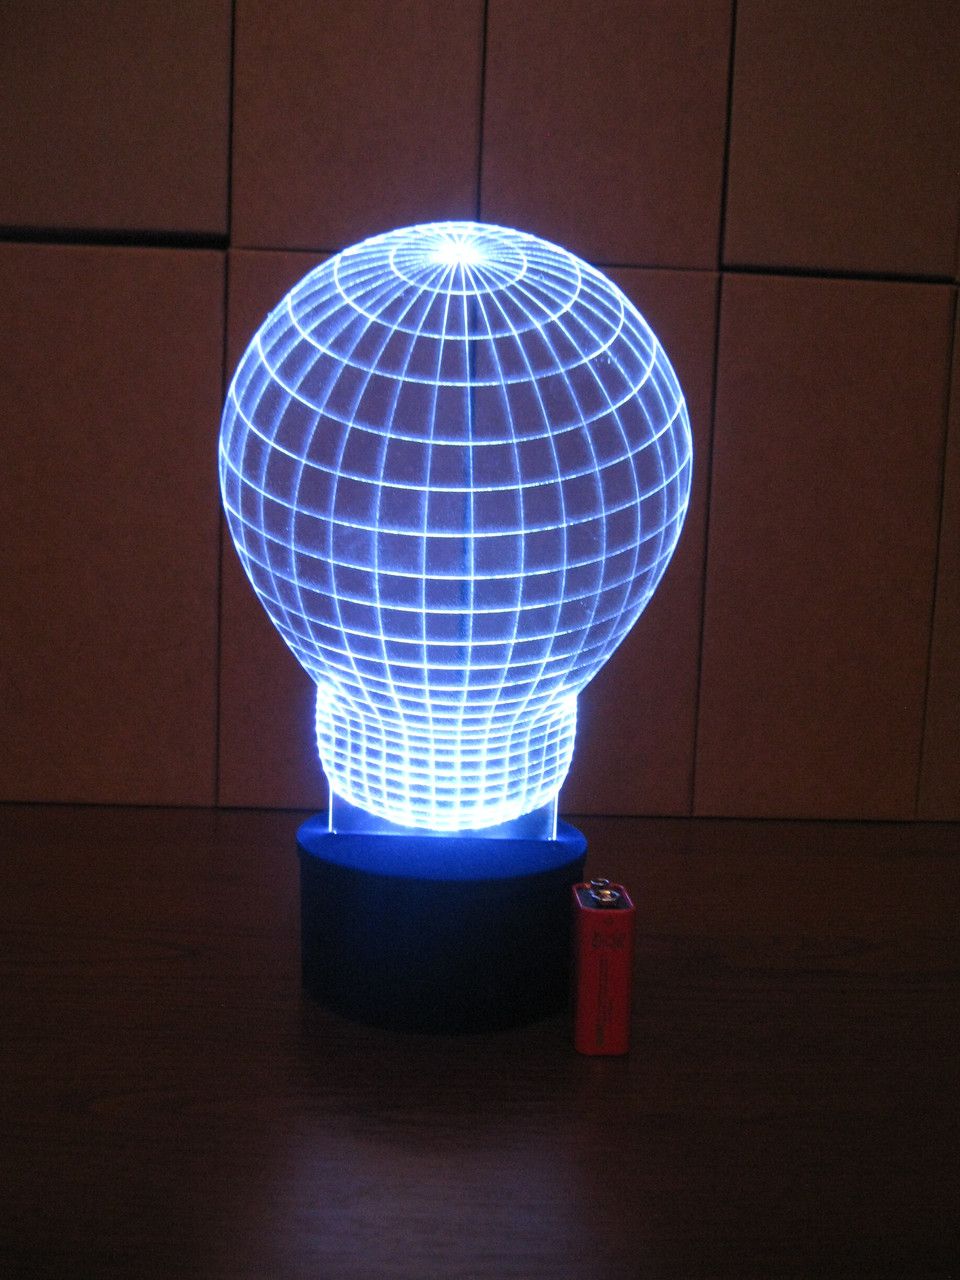 3d-светильник Лампочка, 3д-ночник, несколько подсветок (на батарейке)